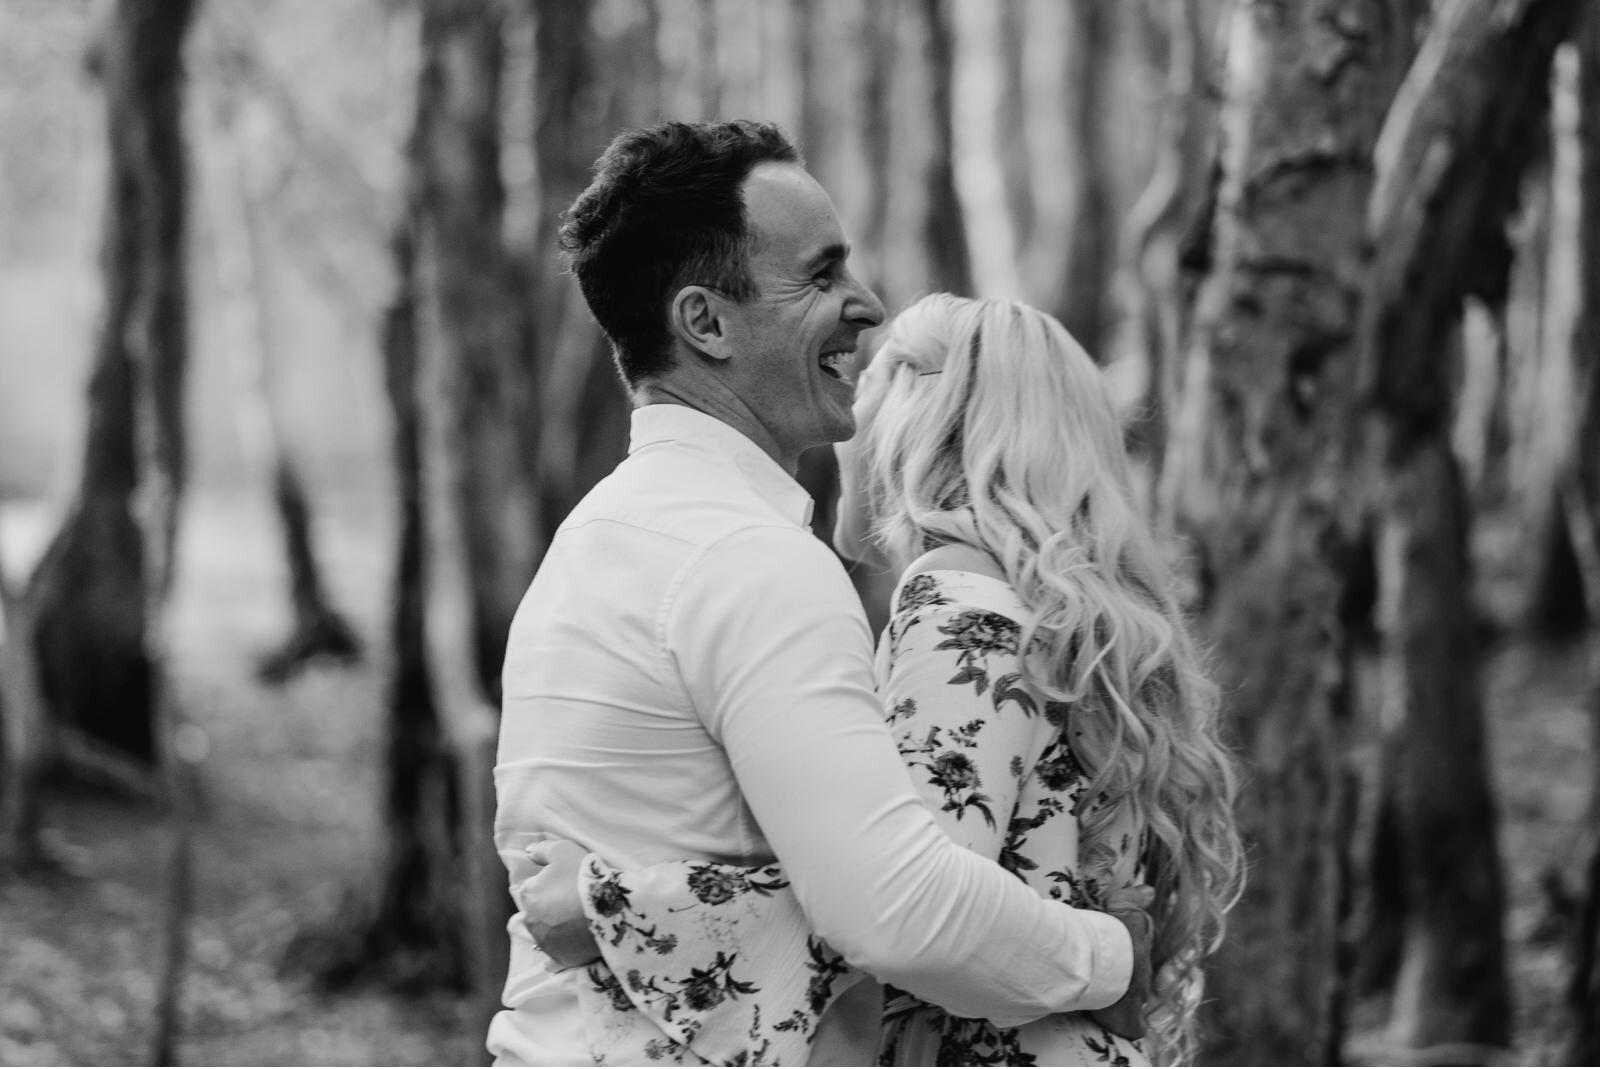 newcastle-wedding-photographer-dudley-engagement-shoot-5.jpg